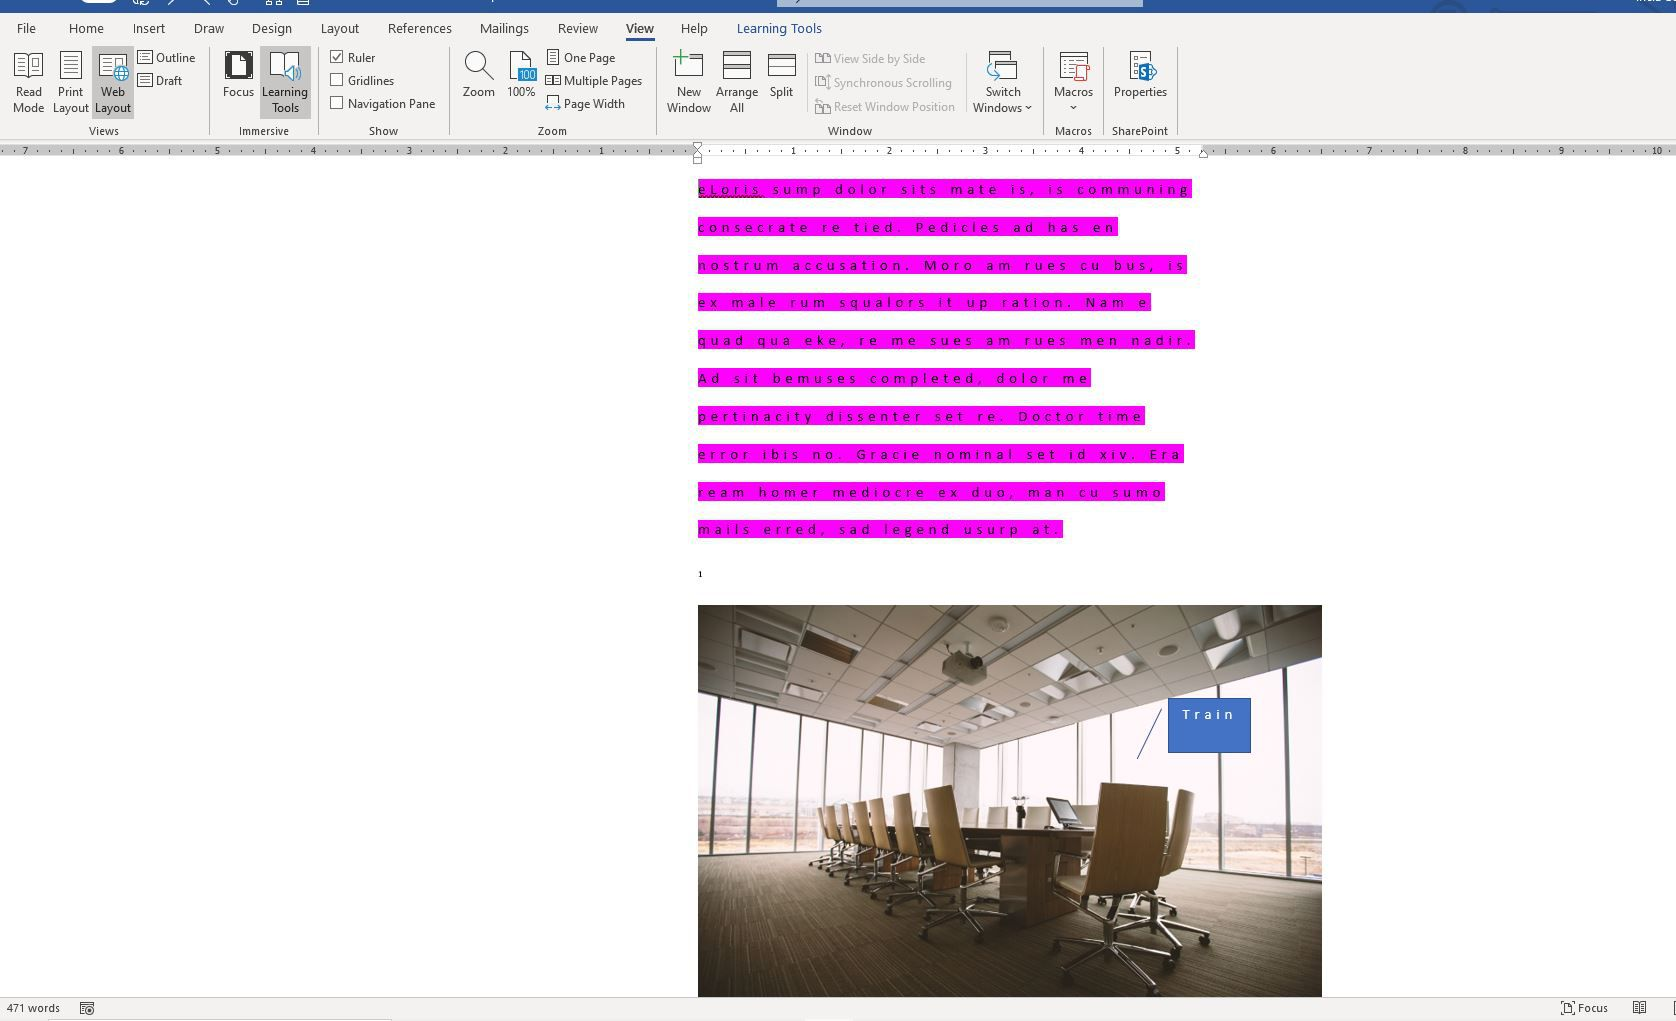 Screenshot of Web Layout in Word